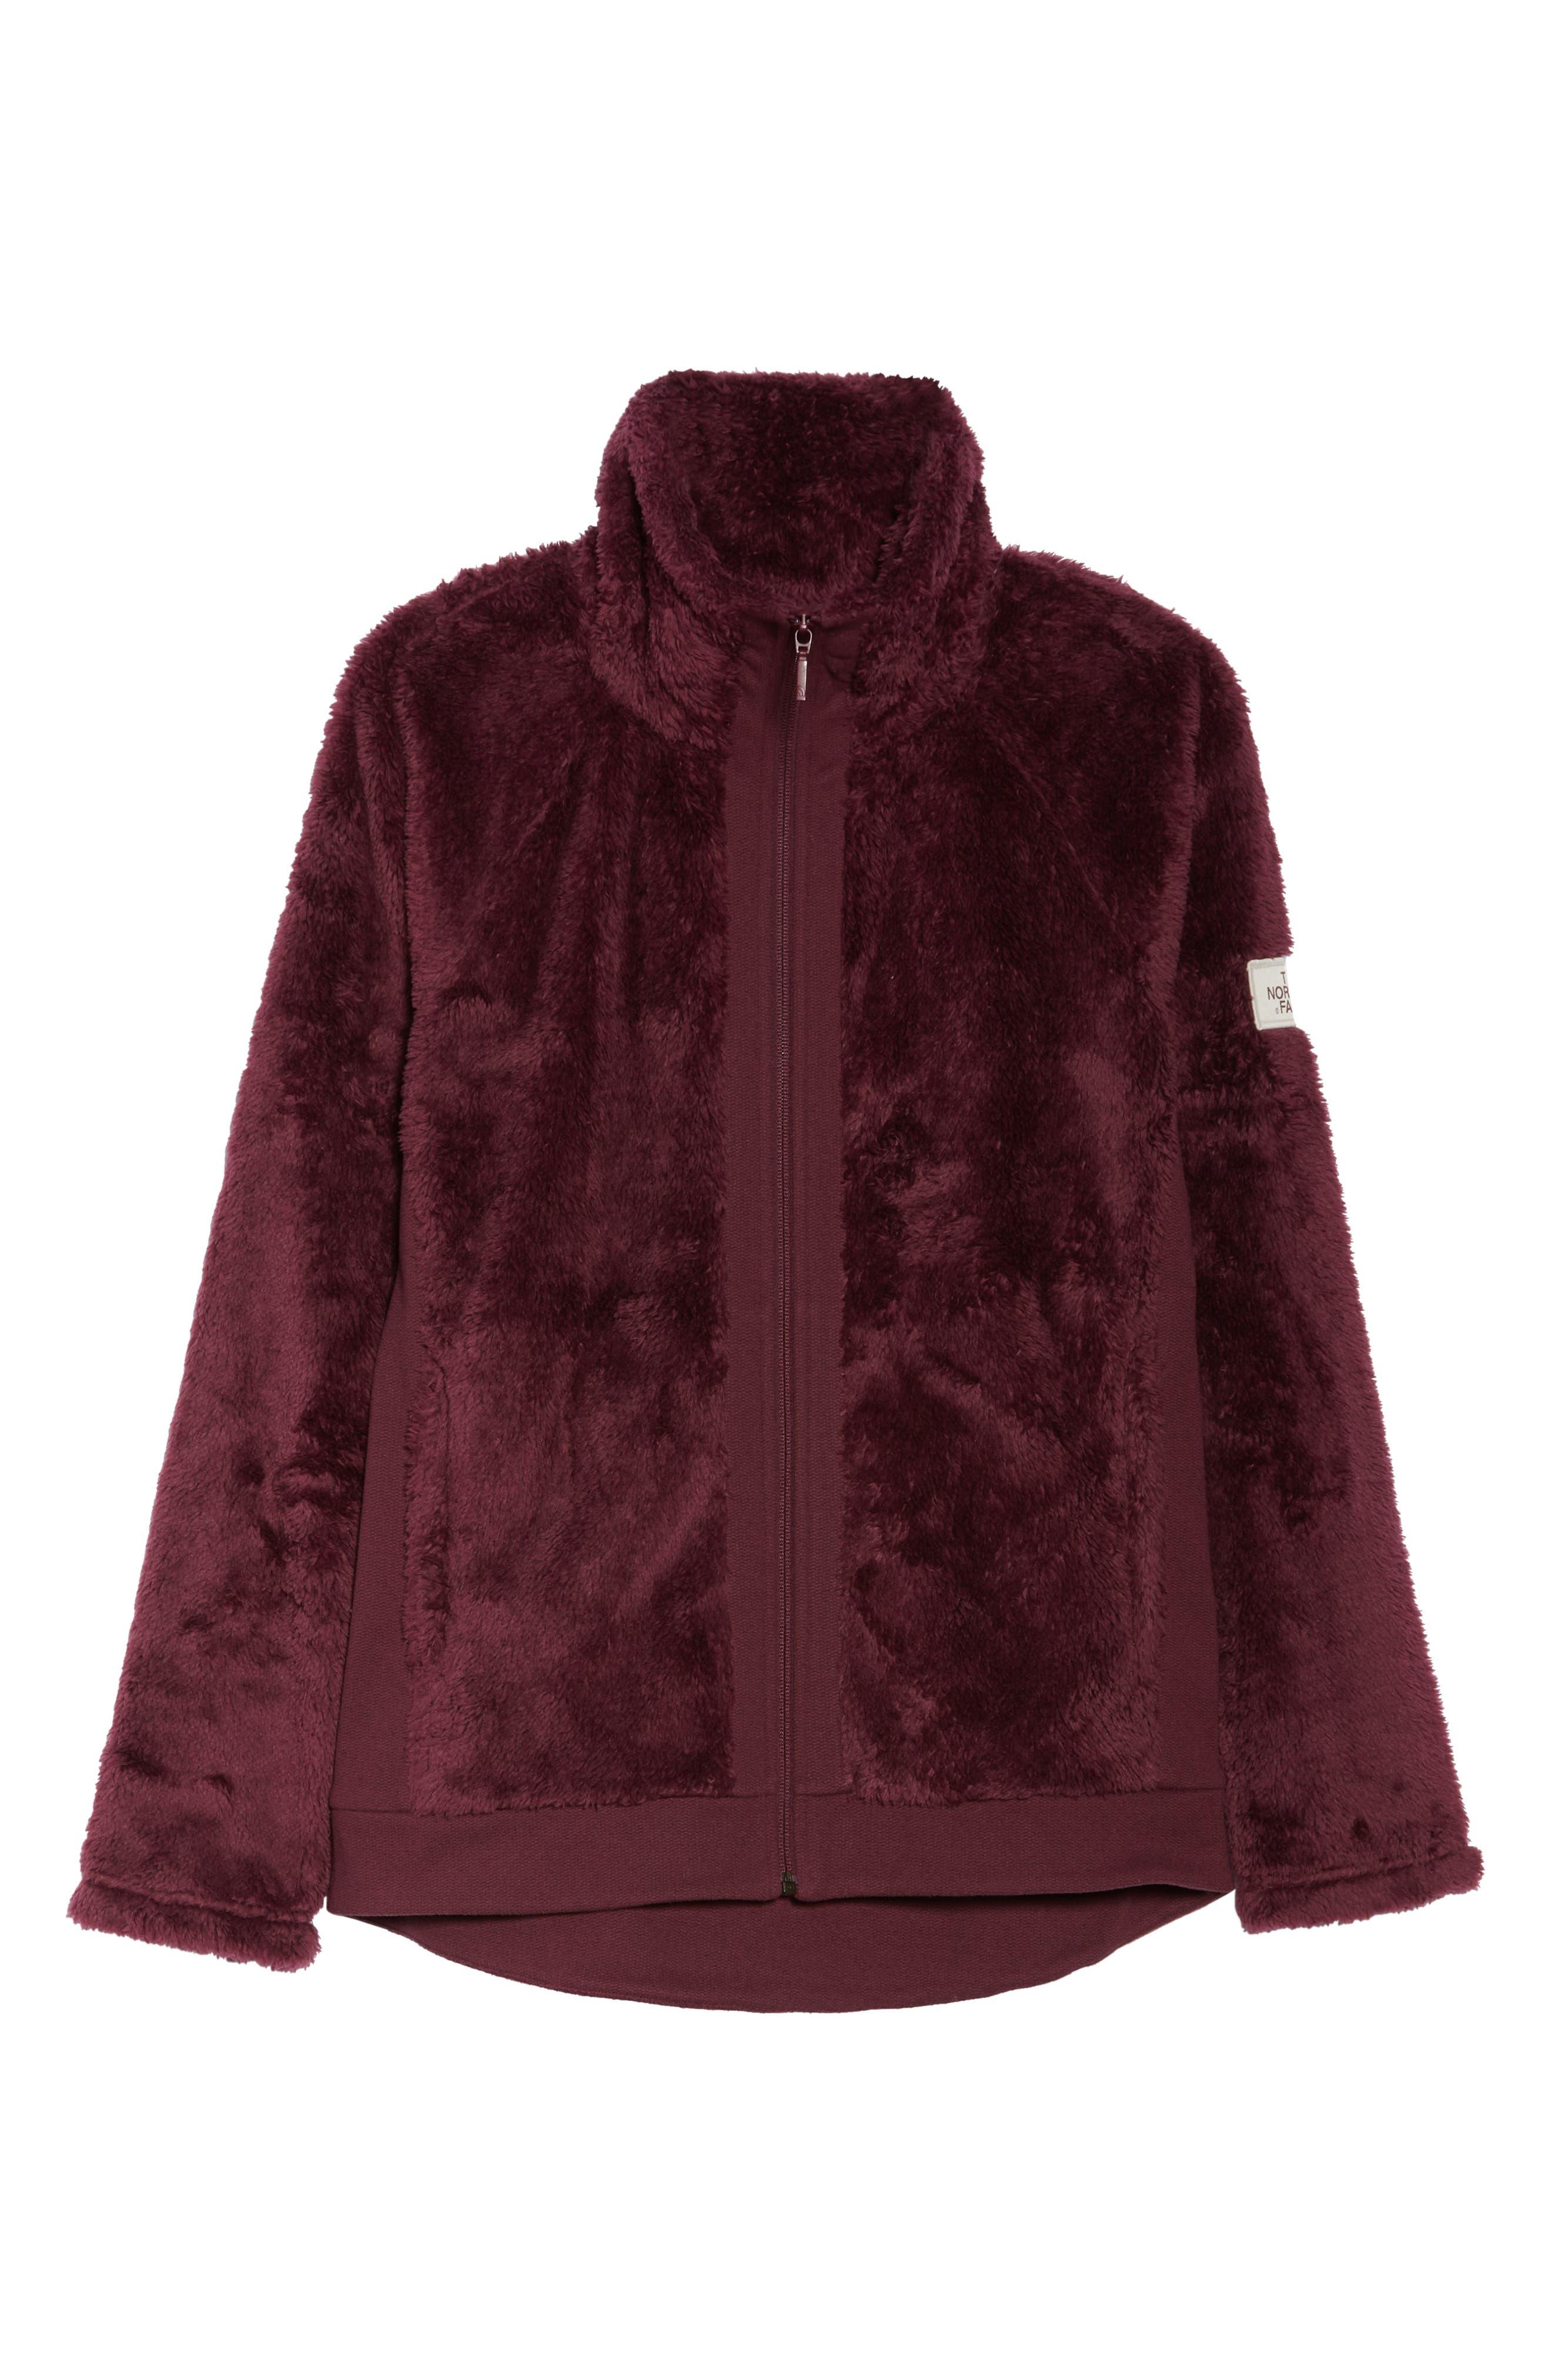 Furry Fleece Jacket,                             Alternate thumbnail 34, color,